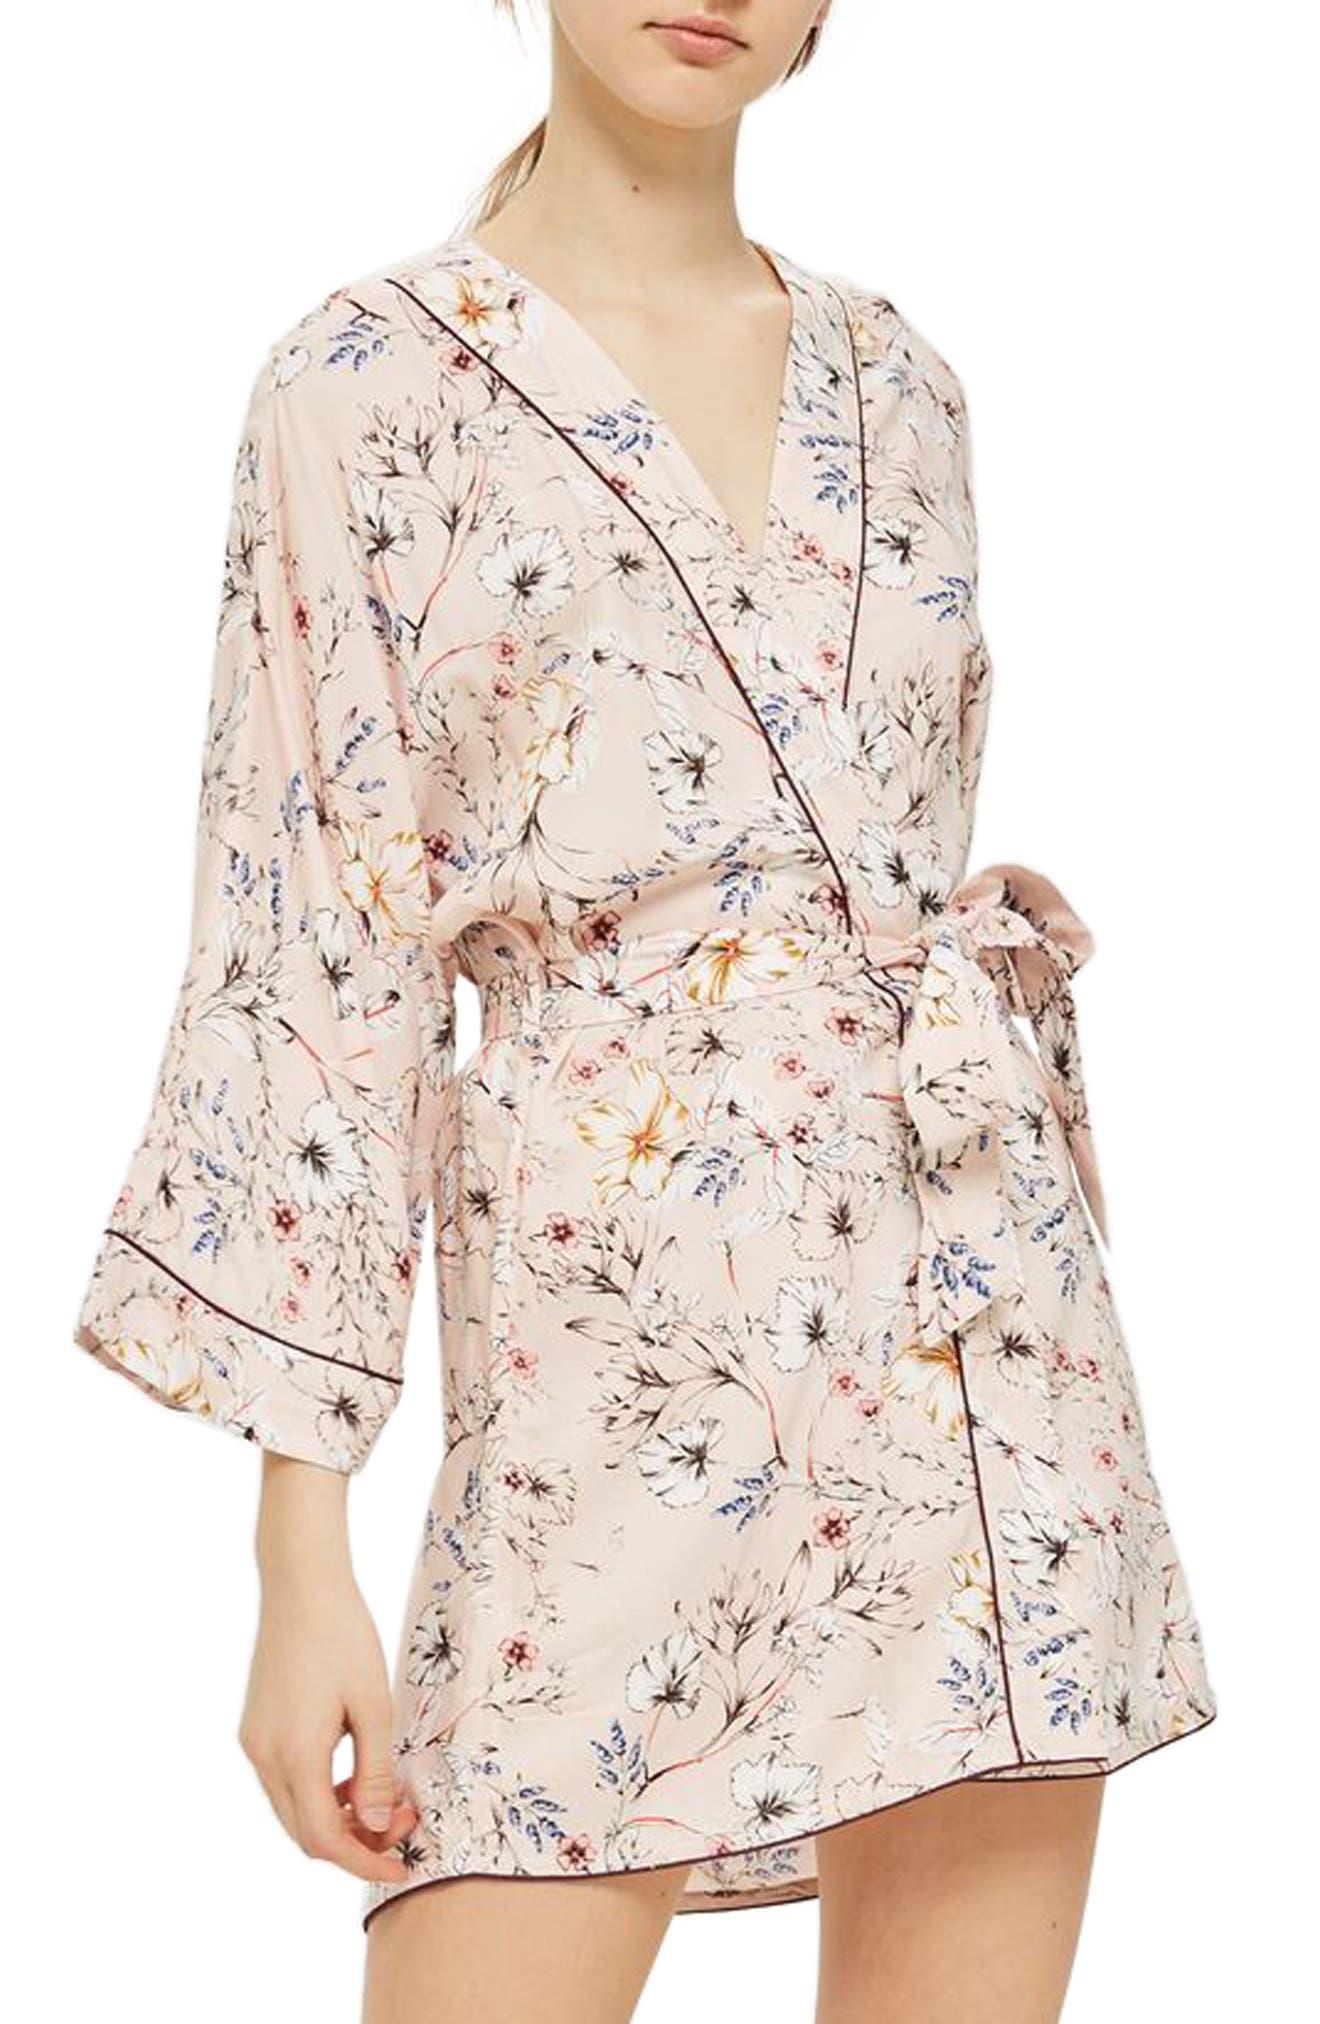 Topshop Sketchy Floral Robe